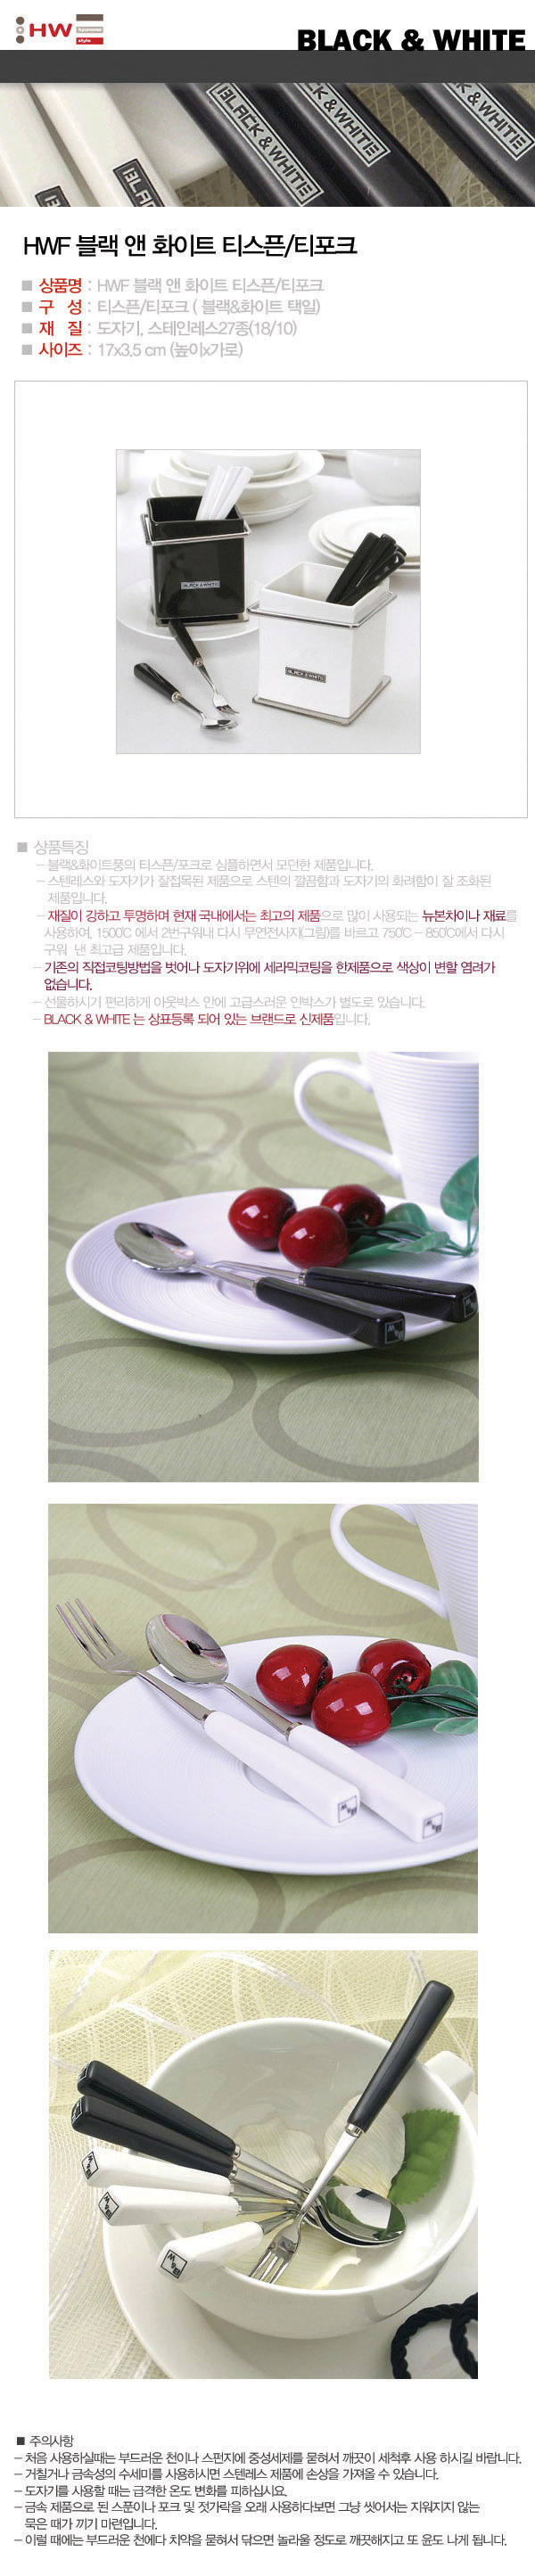 bnw-hwf-tea spoon fok.jpg